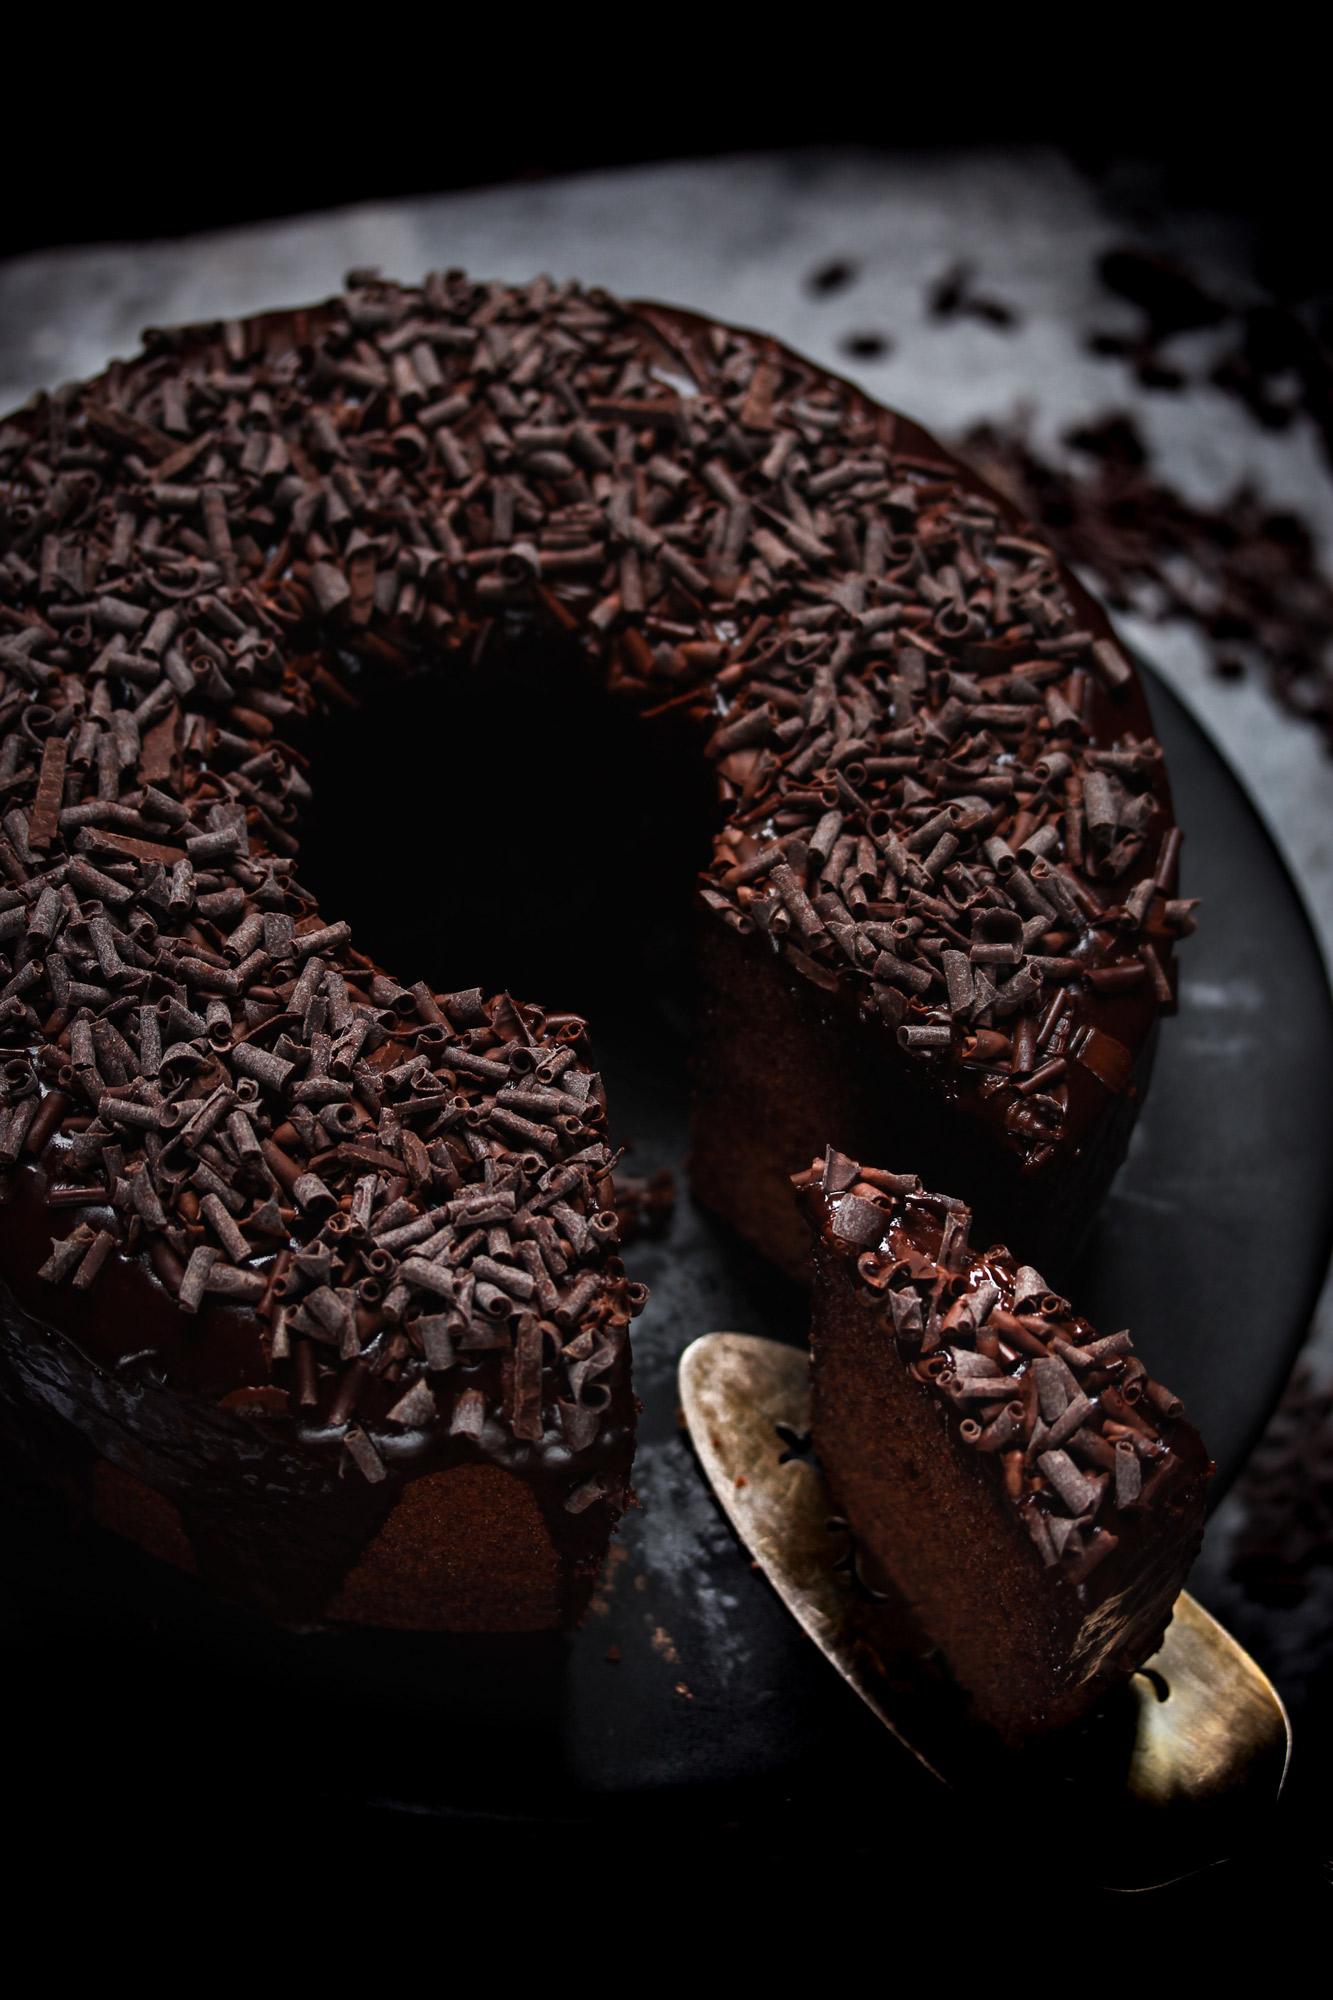 dessert, praliné, pralin , noisette, chocolat, easy, recette, recipe, blogger, chocolate, hazelnut, almond, sweet,chef, blogger, cooking, cake , leger , gateau , light, chabath , shabath , parvé, dairyfree, sans lactoses , bread, homemade, freshly baked, recipe, pain , pain de mie, loaf, MAP, recette, blog, blogger, donut, beignet, hannouca, doughnut, hanouka, sucre, chocolate mousse, creamy, foamy, light, fluffy, airy, chocolate, sweet, vegan, recipe, light, healthy, gluten free, chocolat, recite, kosher, kasher, cacher, dessert, sucré, facile, rapide, quick, easy, passover, pessah, pace, kosher , kasher, milk chocolate, chocolat au lait, fondant, cake, chocolate cake, cake au chocolat, parve, parvé;